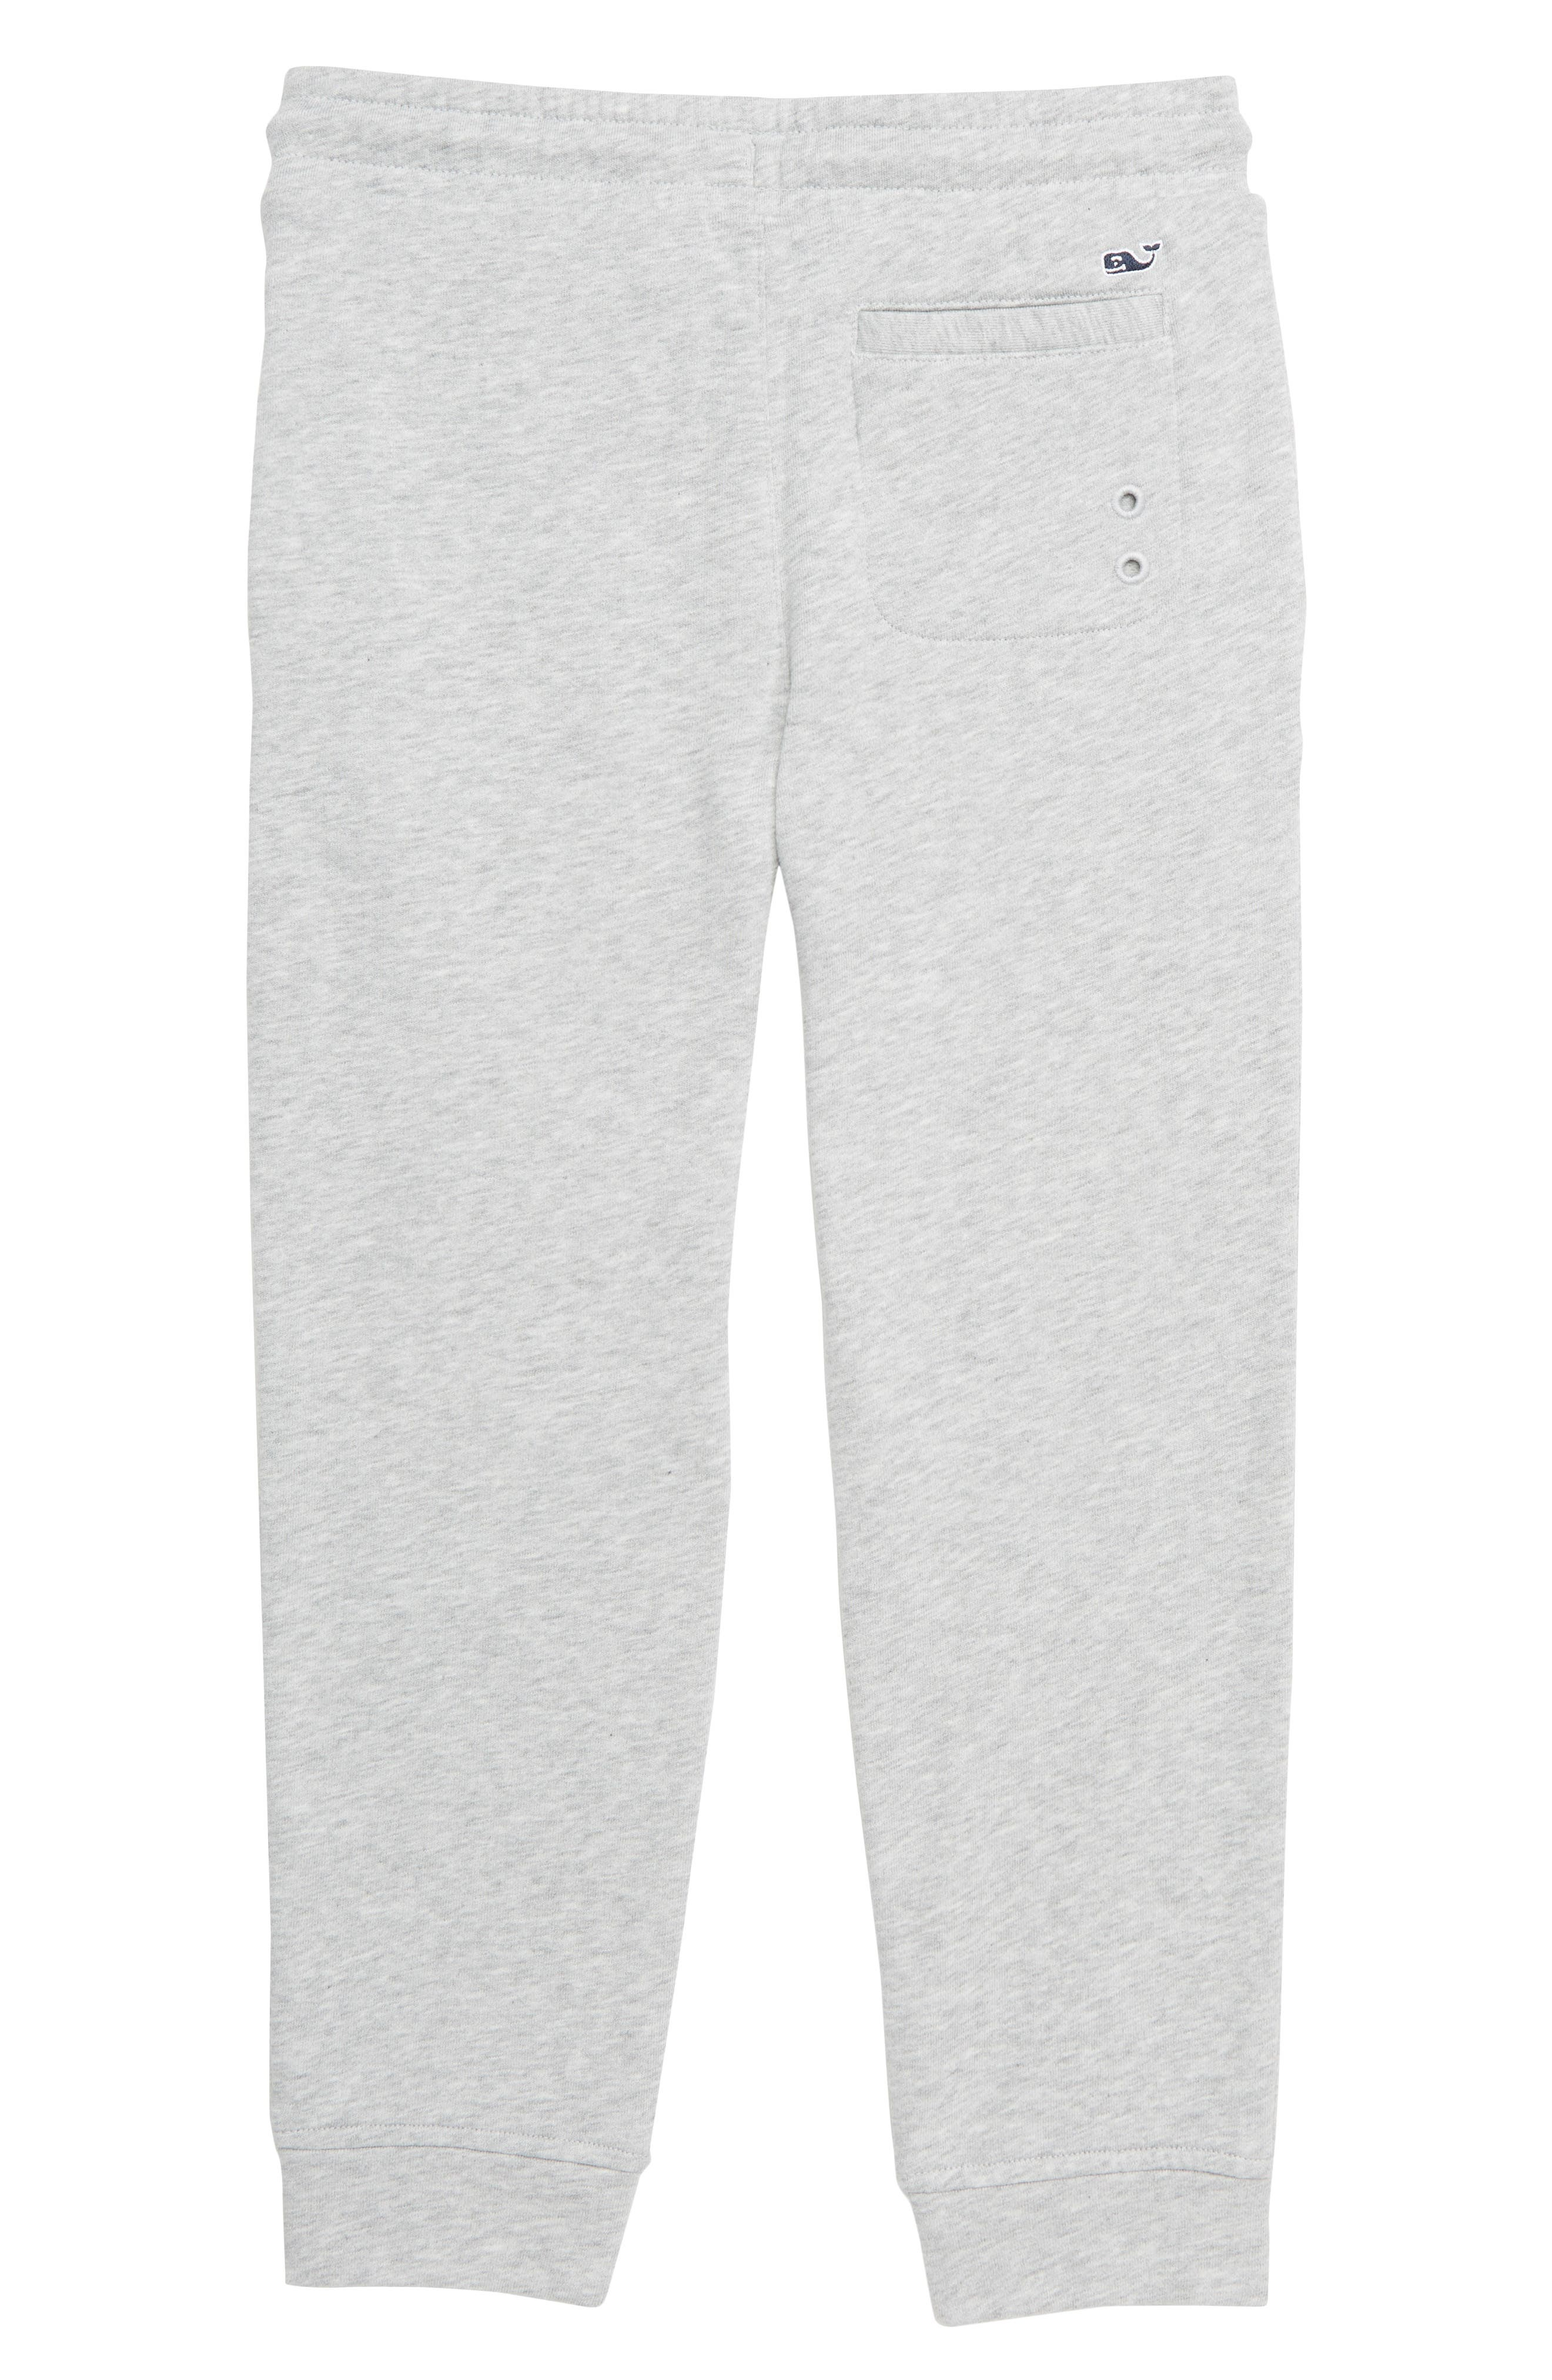 VINEYARD VINES, Go Knit Jogger Sweatpants, Alternate thumbnail 2, color, MEDIUM HEATHER GRAY